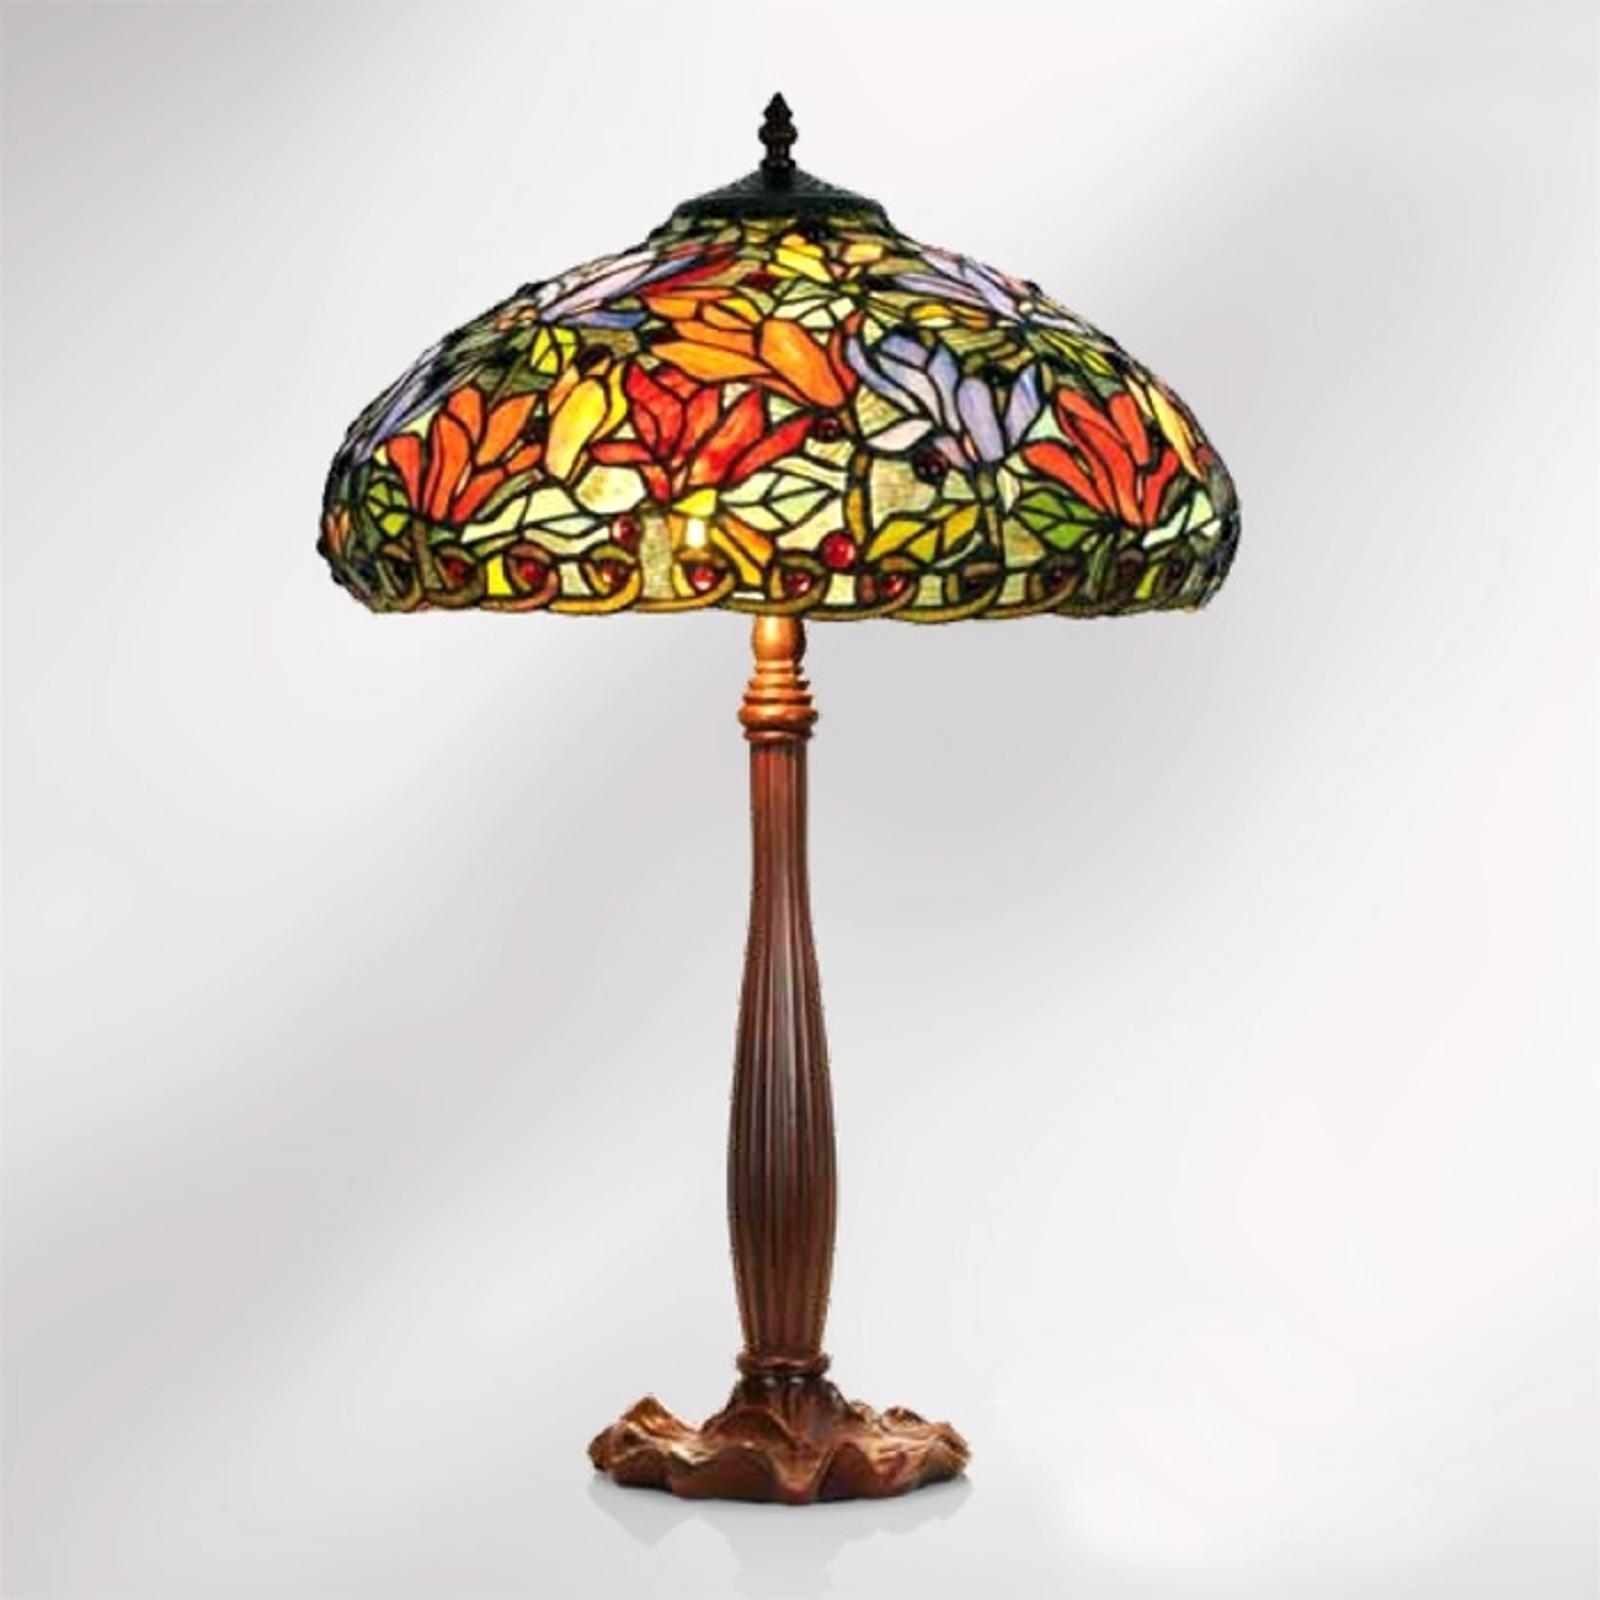 Bordslampa Elaine, blomstermönster i tiffanystil